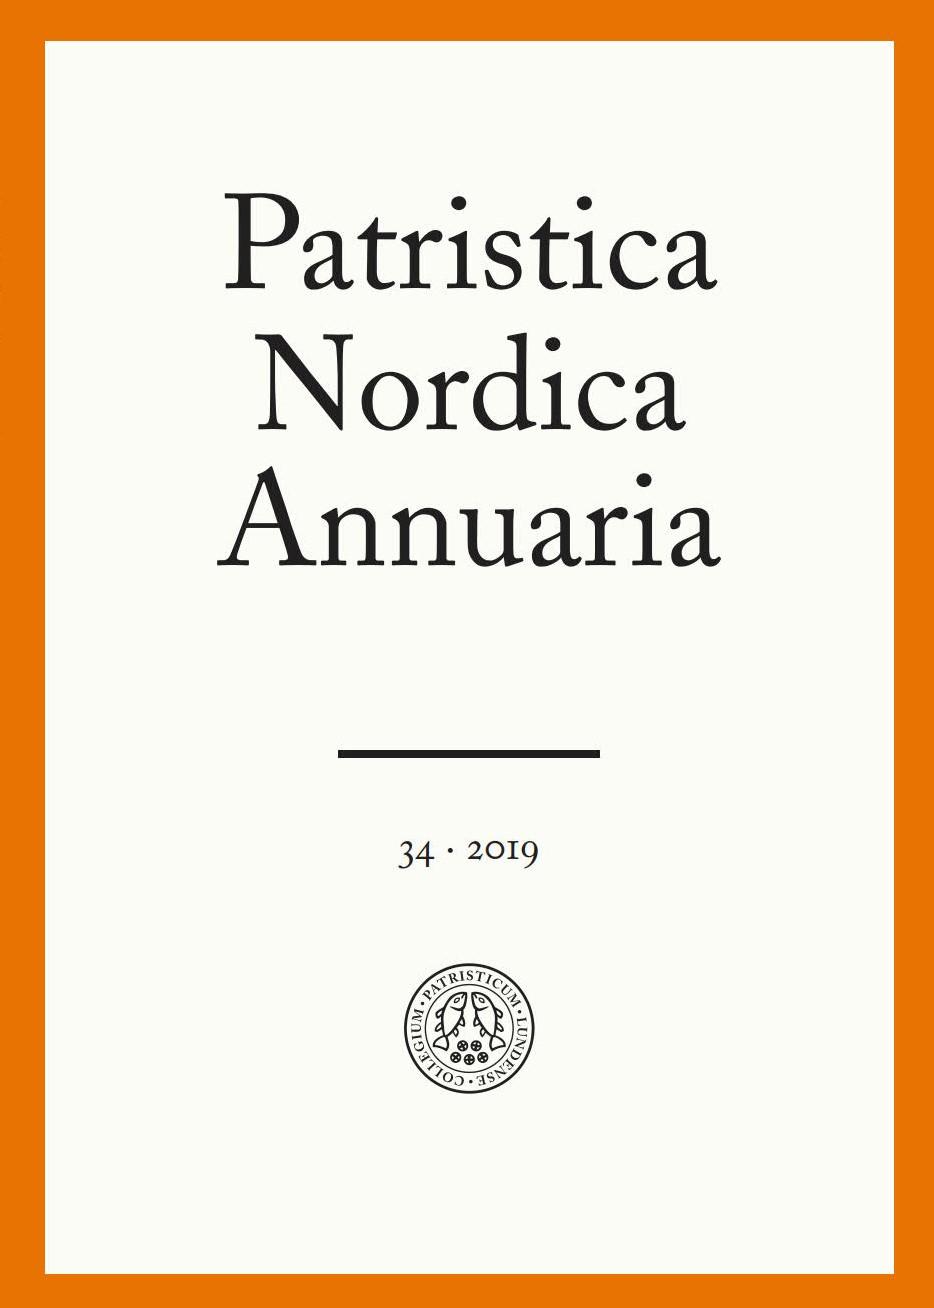 Visa Vol 34 (2019): Patristica Nordica Annuaria